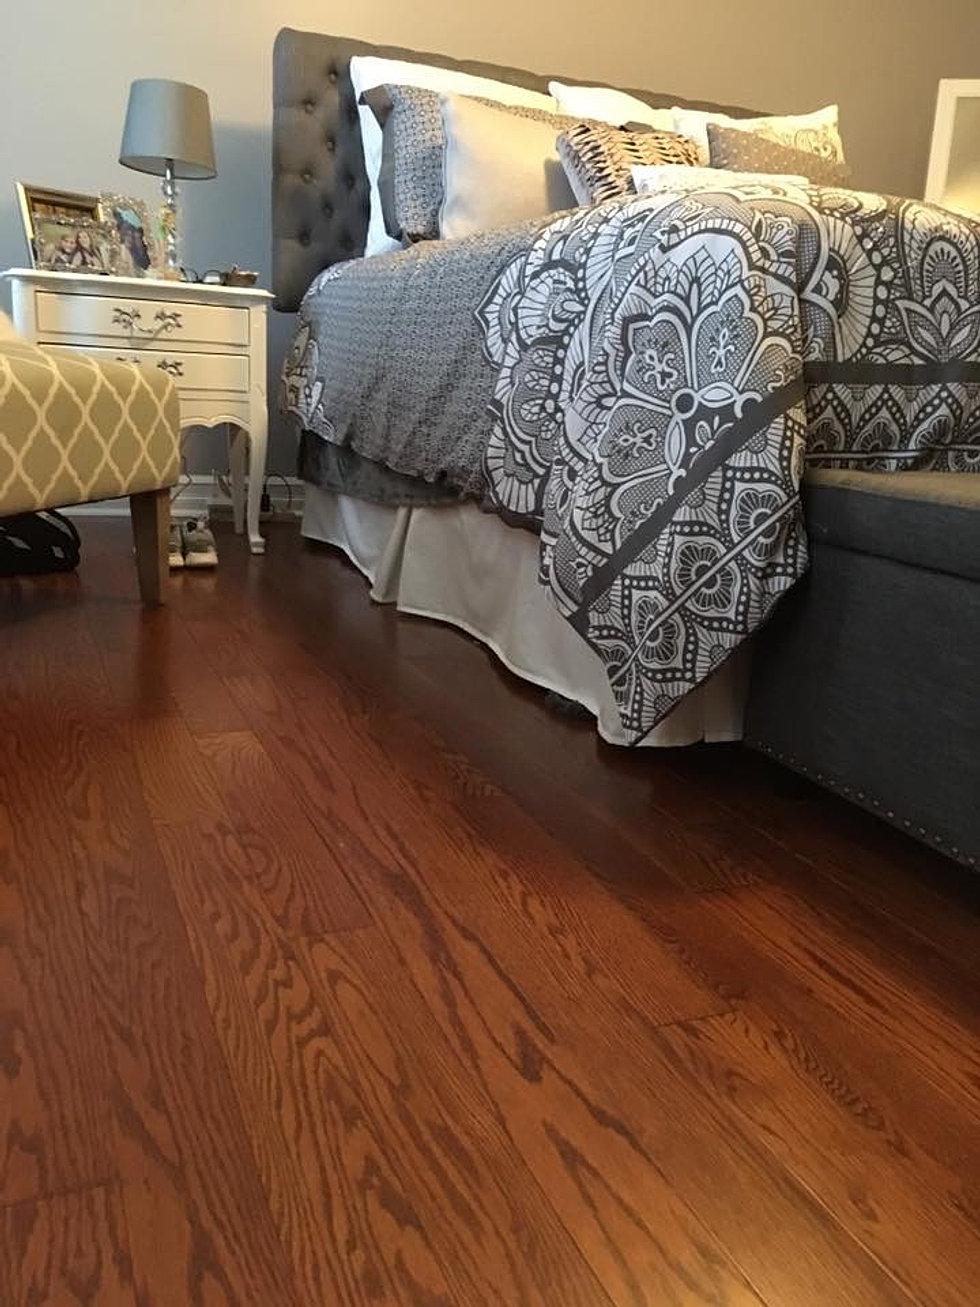 Hardwood Flooring Buffalo Ny awesome hardwood floor refinishing attleboro ma Nickel City Hardwood Floor